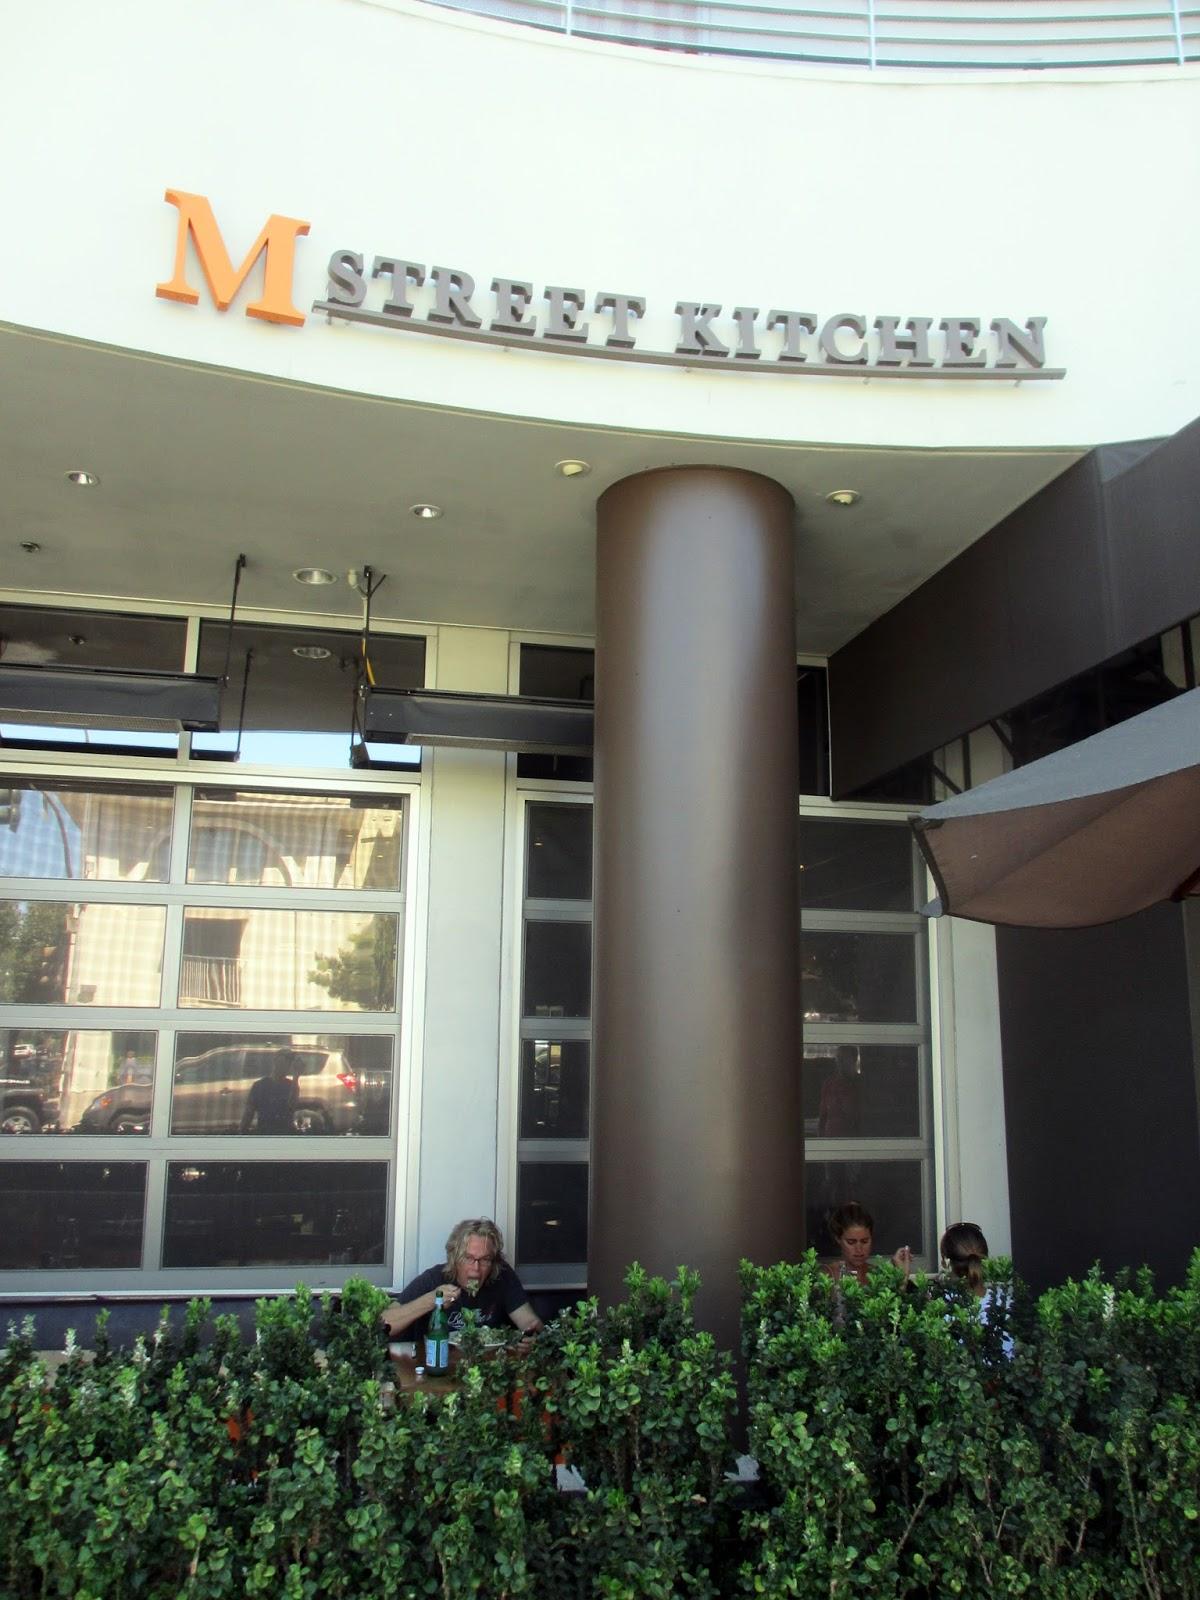 Florida Burger Lover: M Street Kitchen - Los Angeles